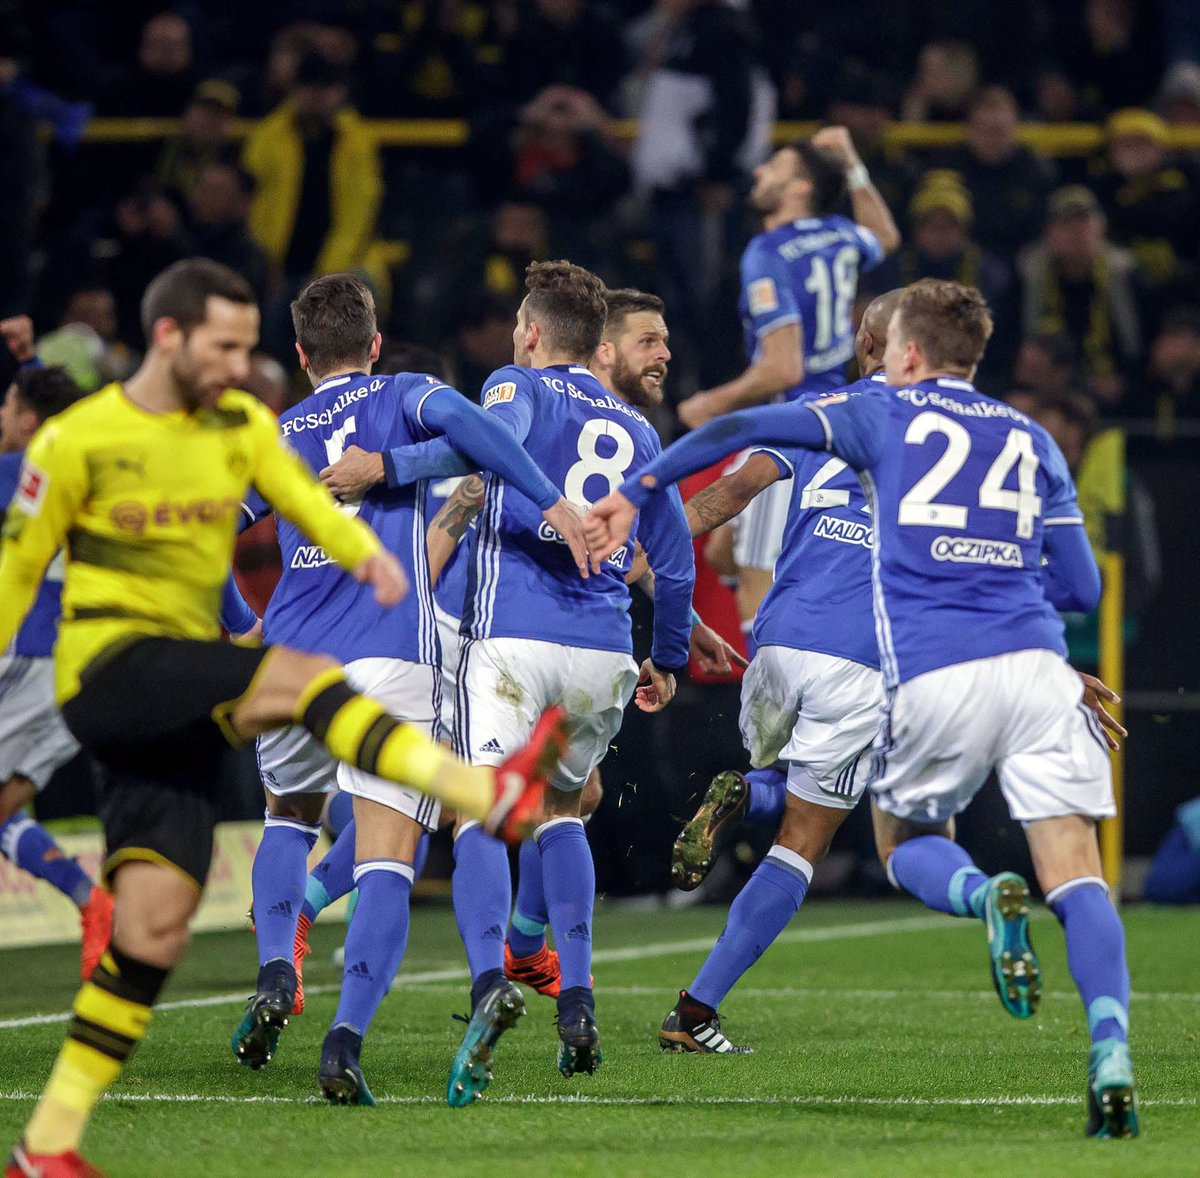 Боруссия Дортмунд – Шальке. Прогноз матча чемпионата Германии